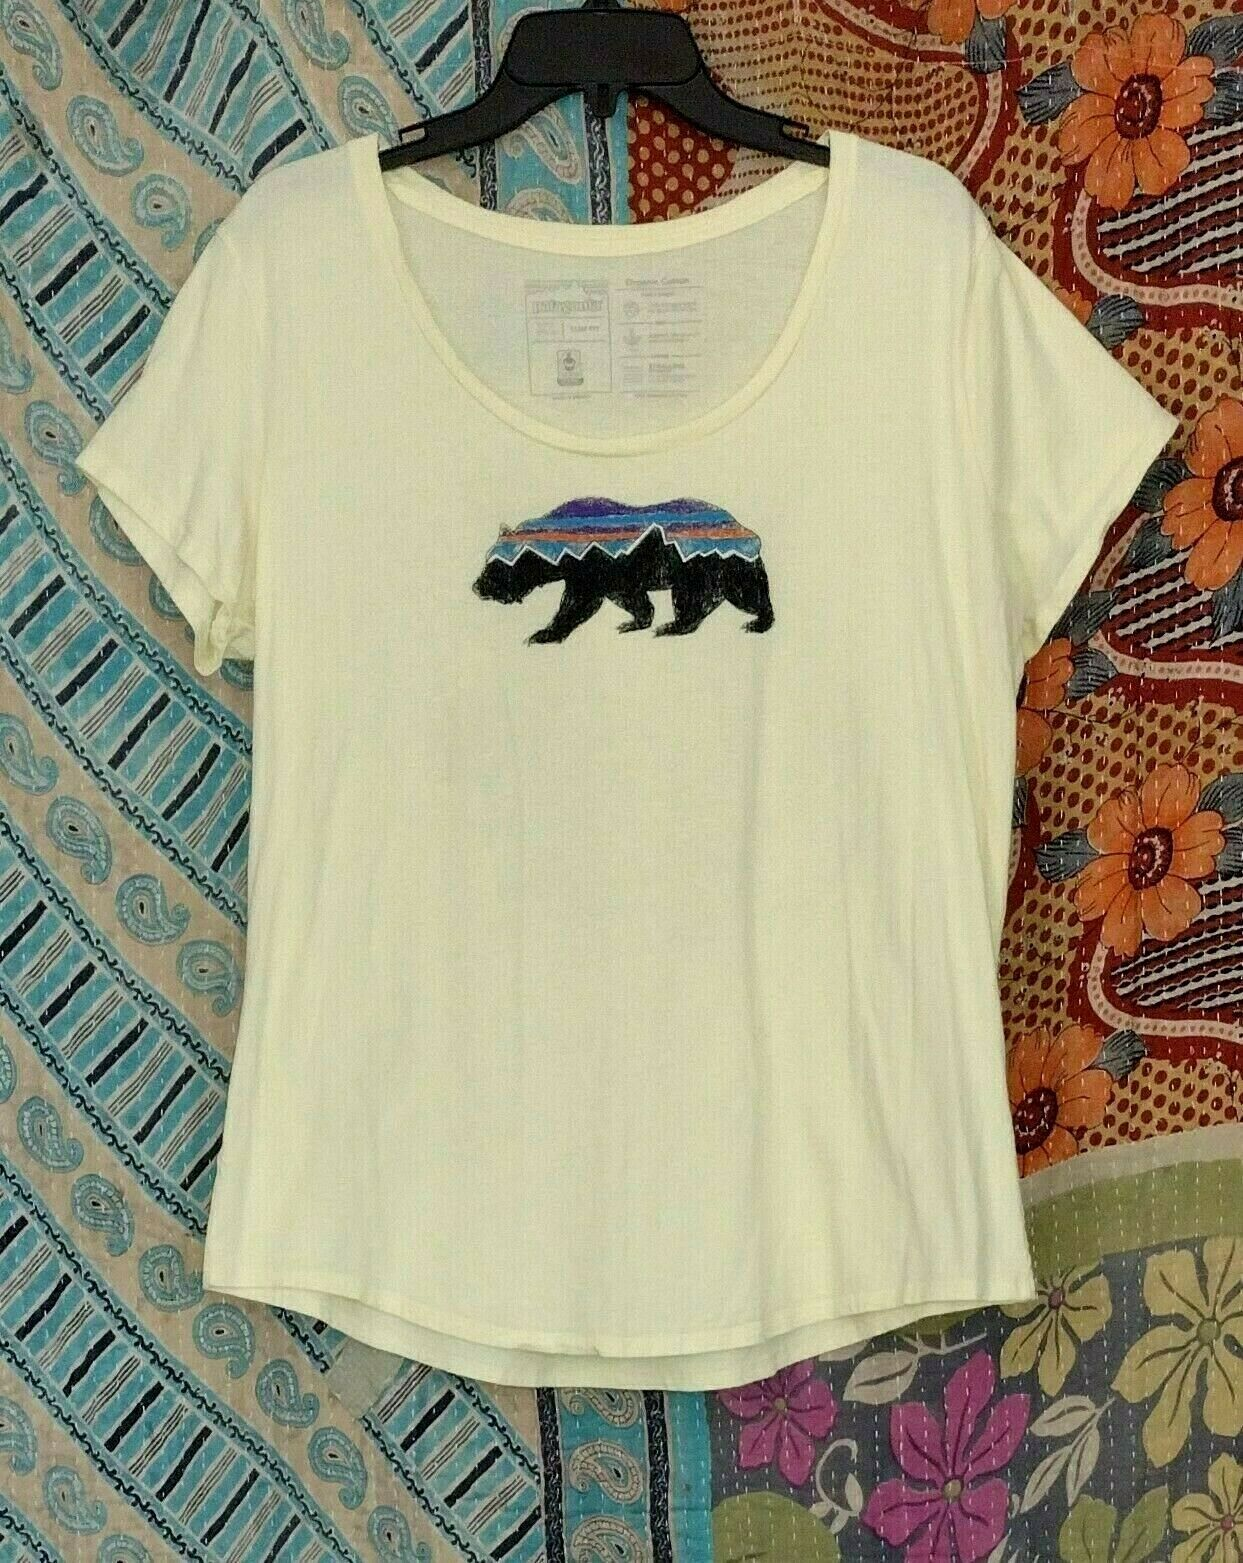 Women's Patagonia Scoop Neck Organic CottonT-shirt Southwestern Bear XL 44B